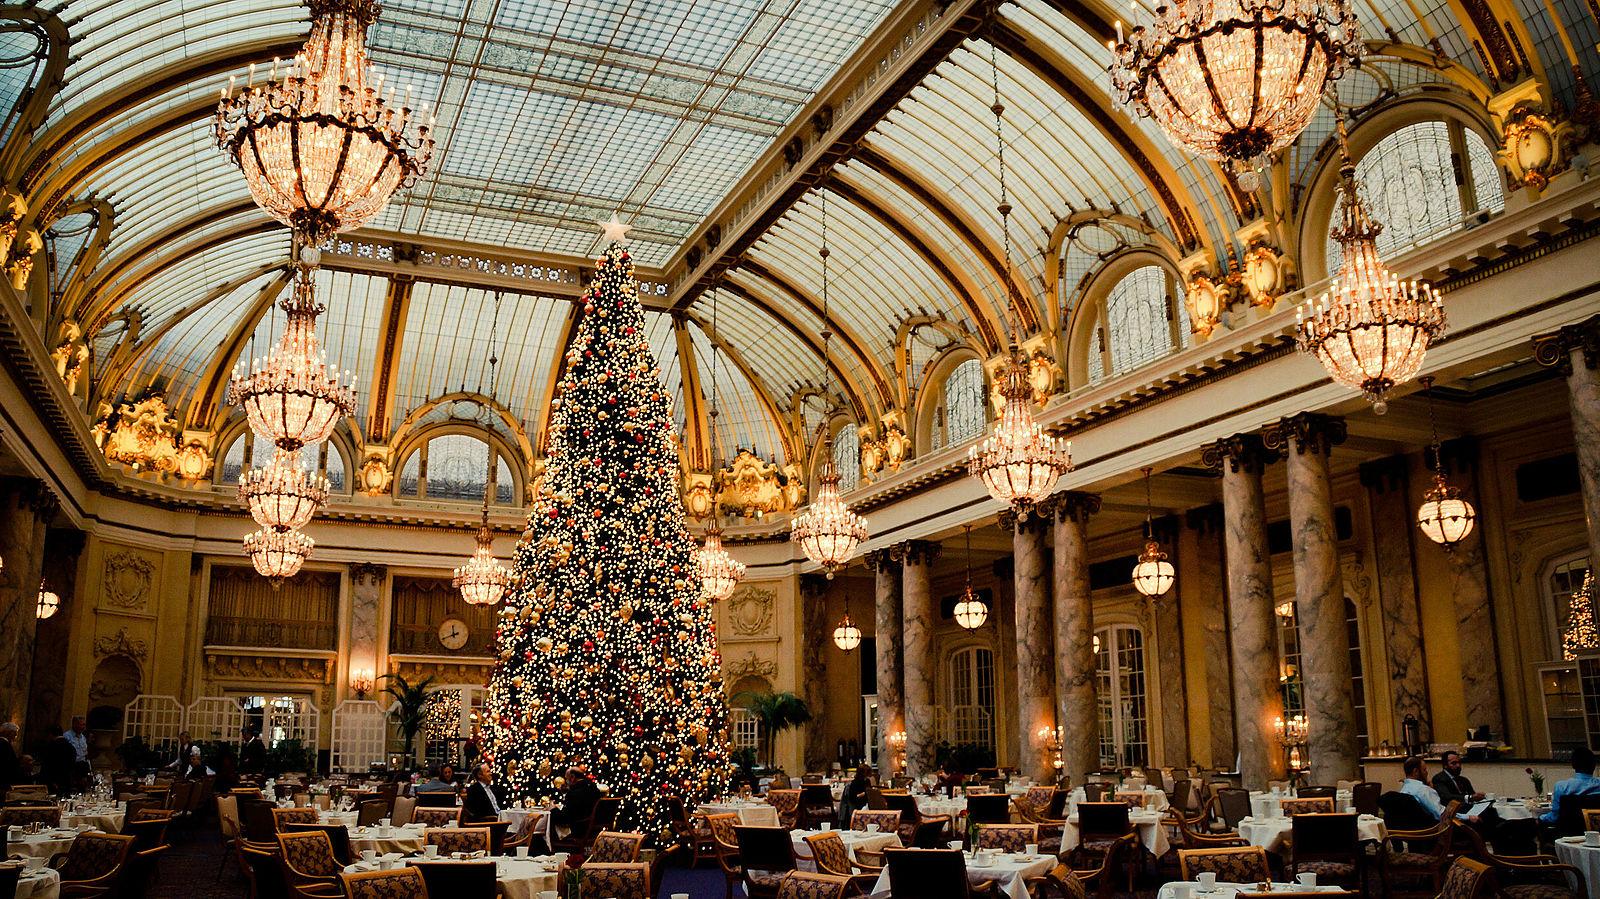 The_Palace_Hotel,_San_Francisco,_California.jpg